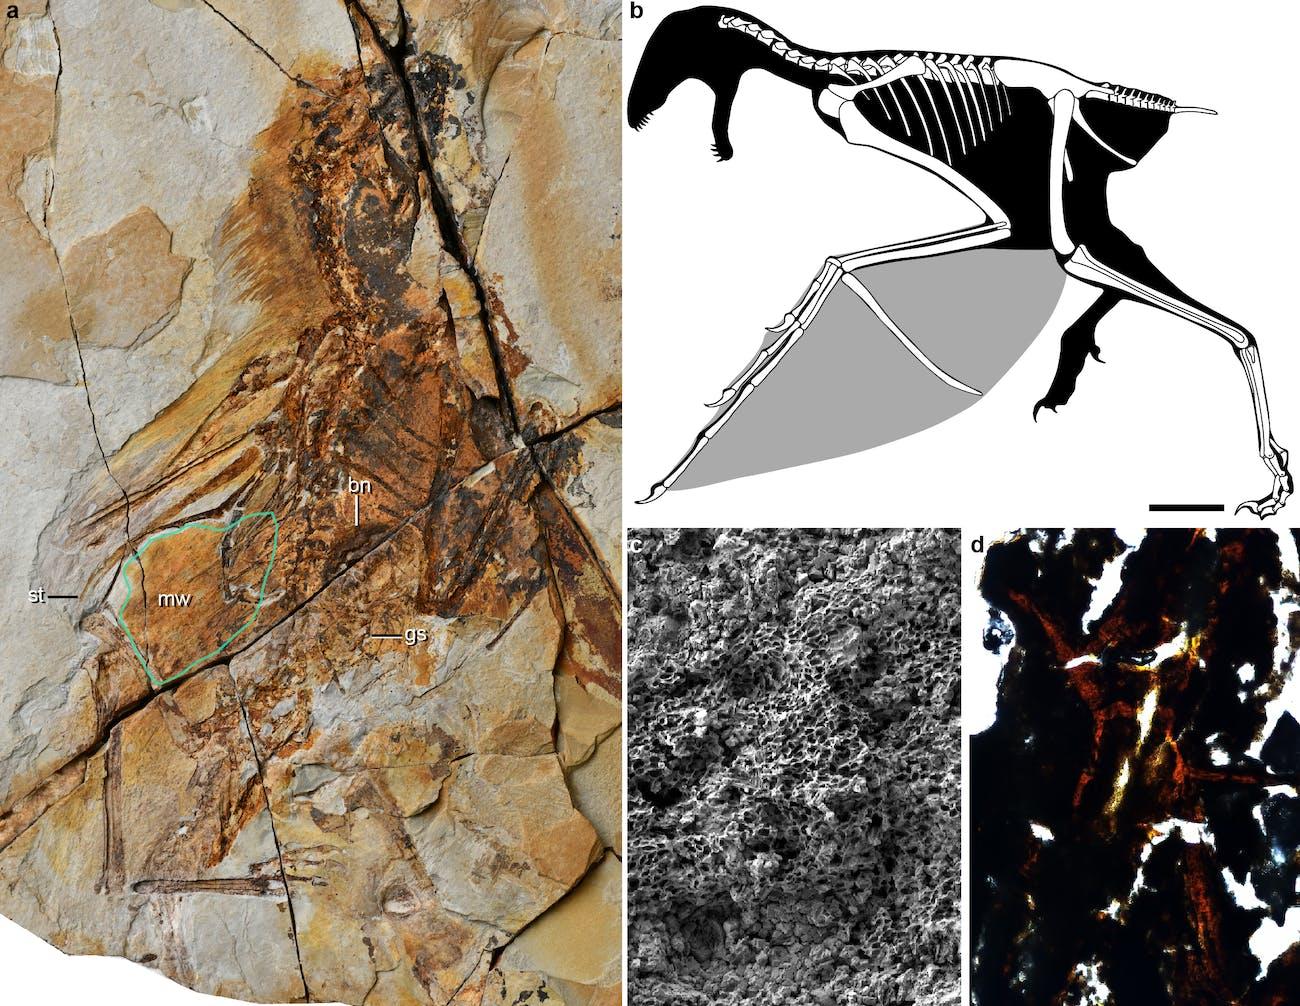 Ambopteryx longbrachium